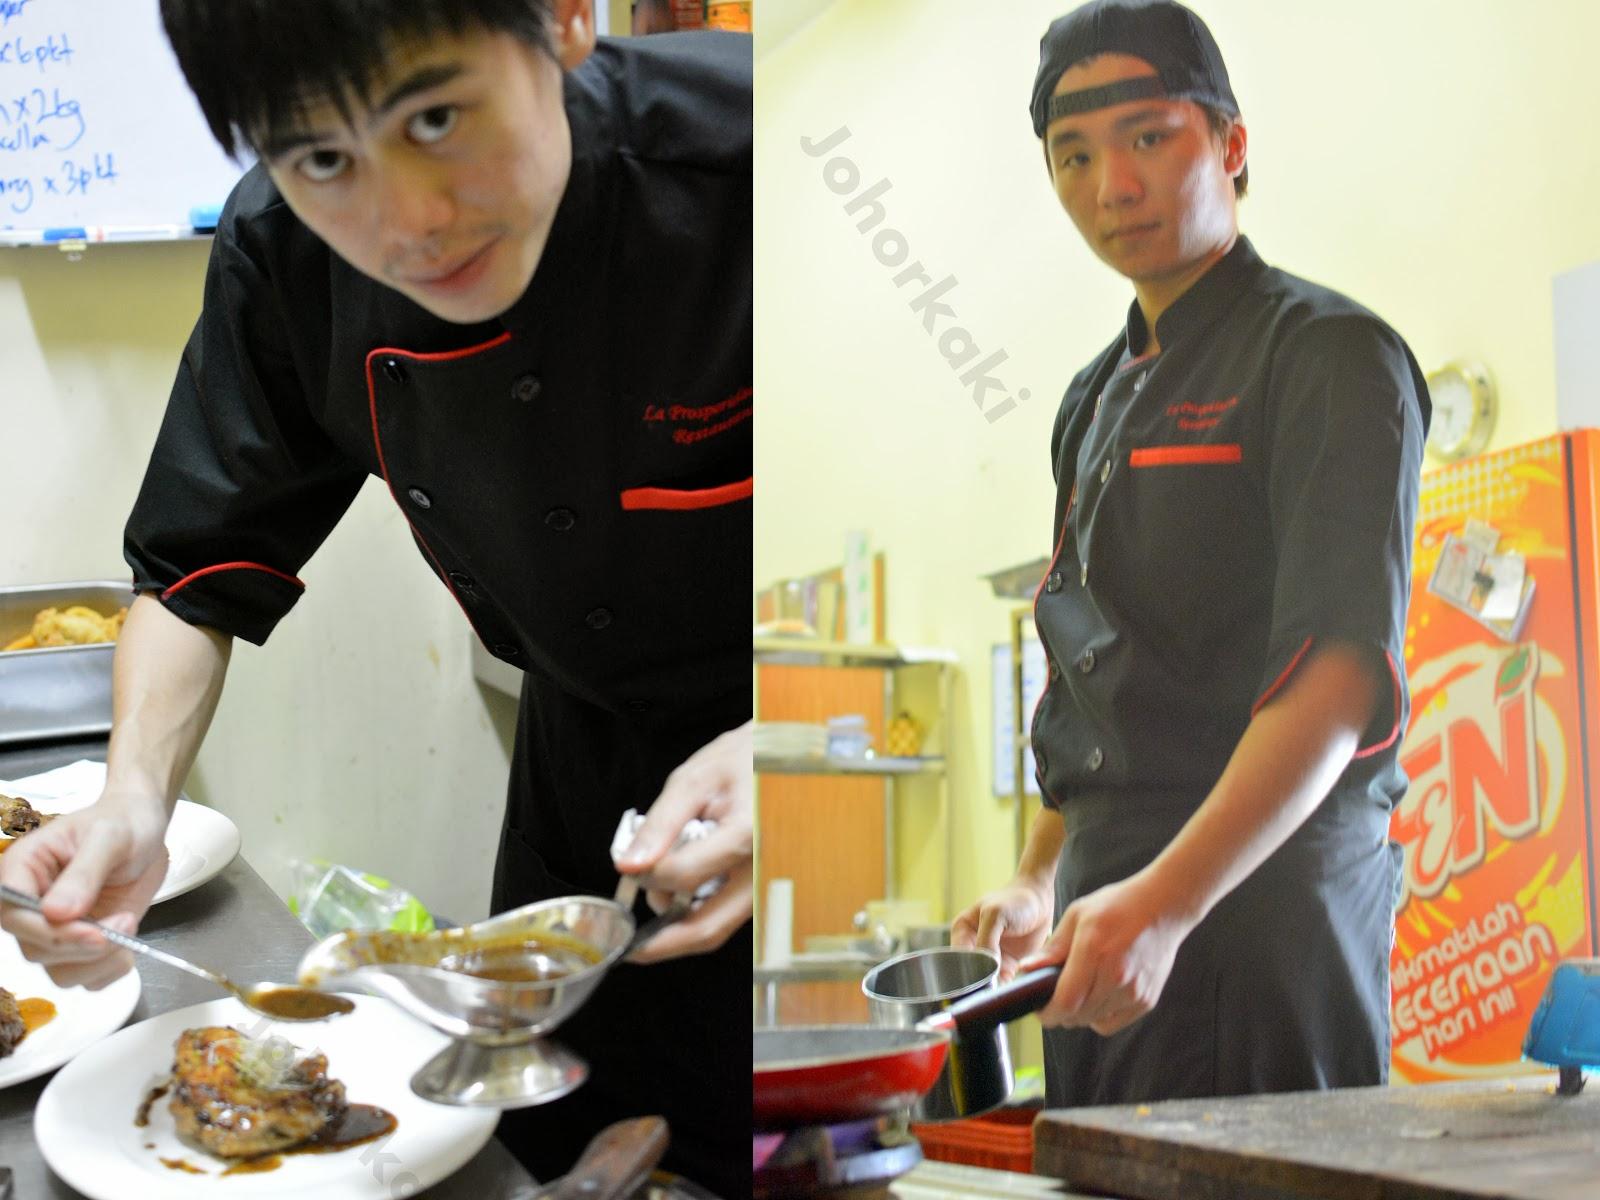 Johor Western Food Buffet at La Prosperidad De Restaurant 兴旺发